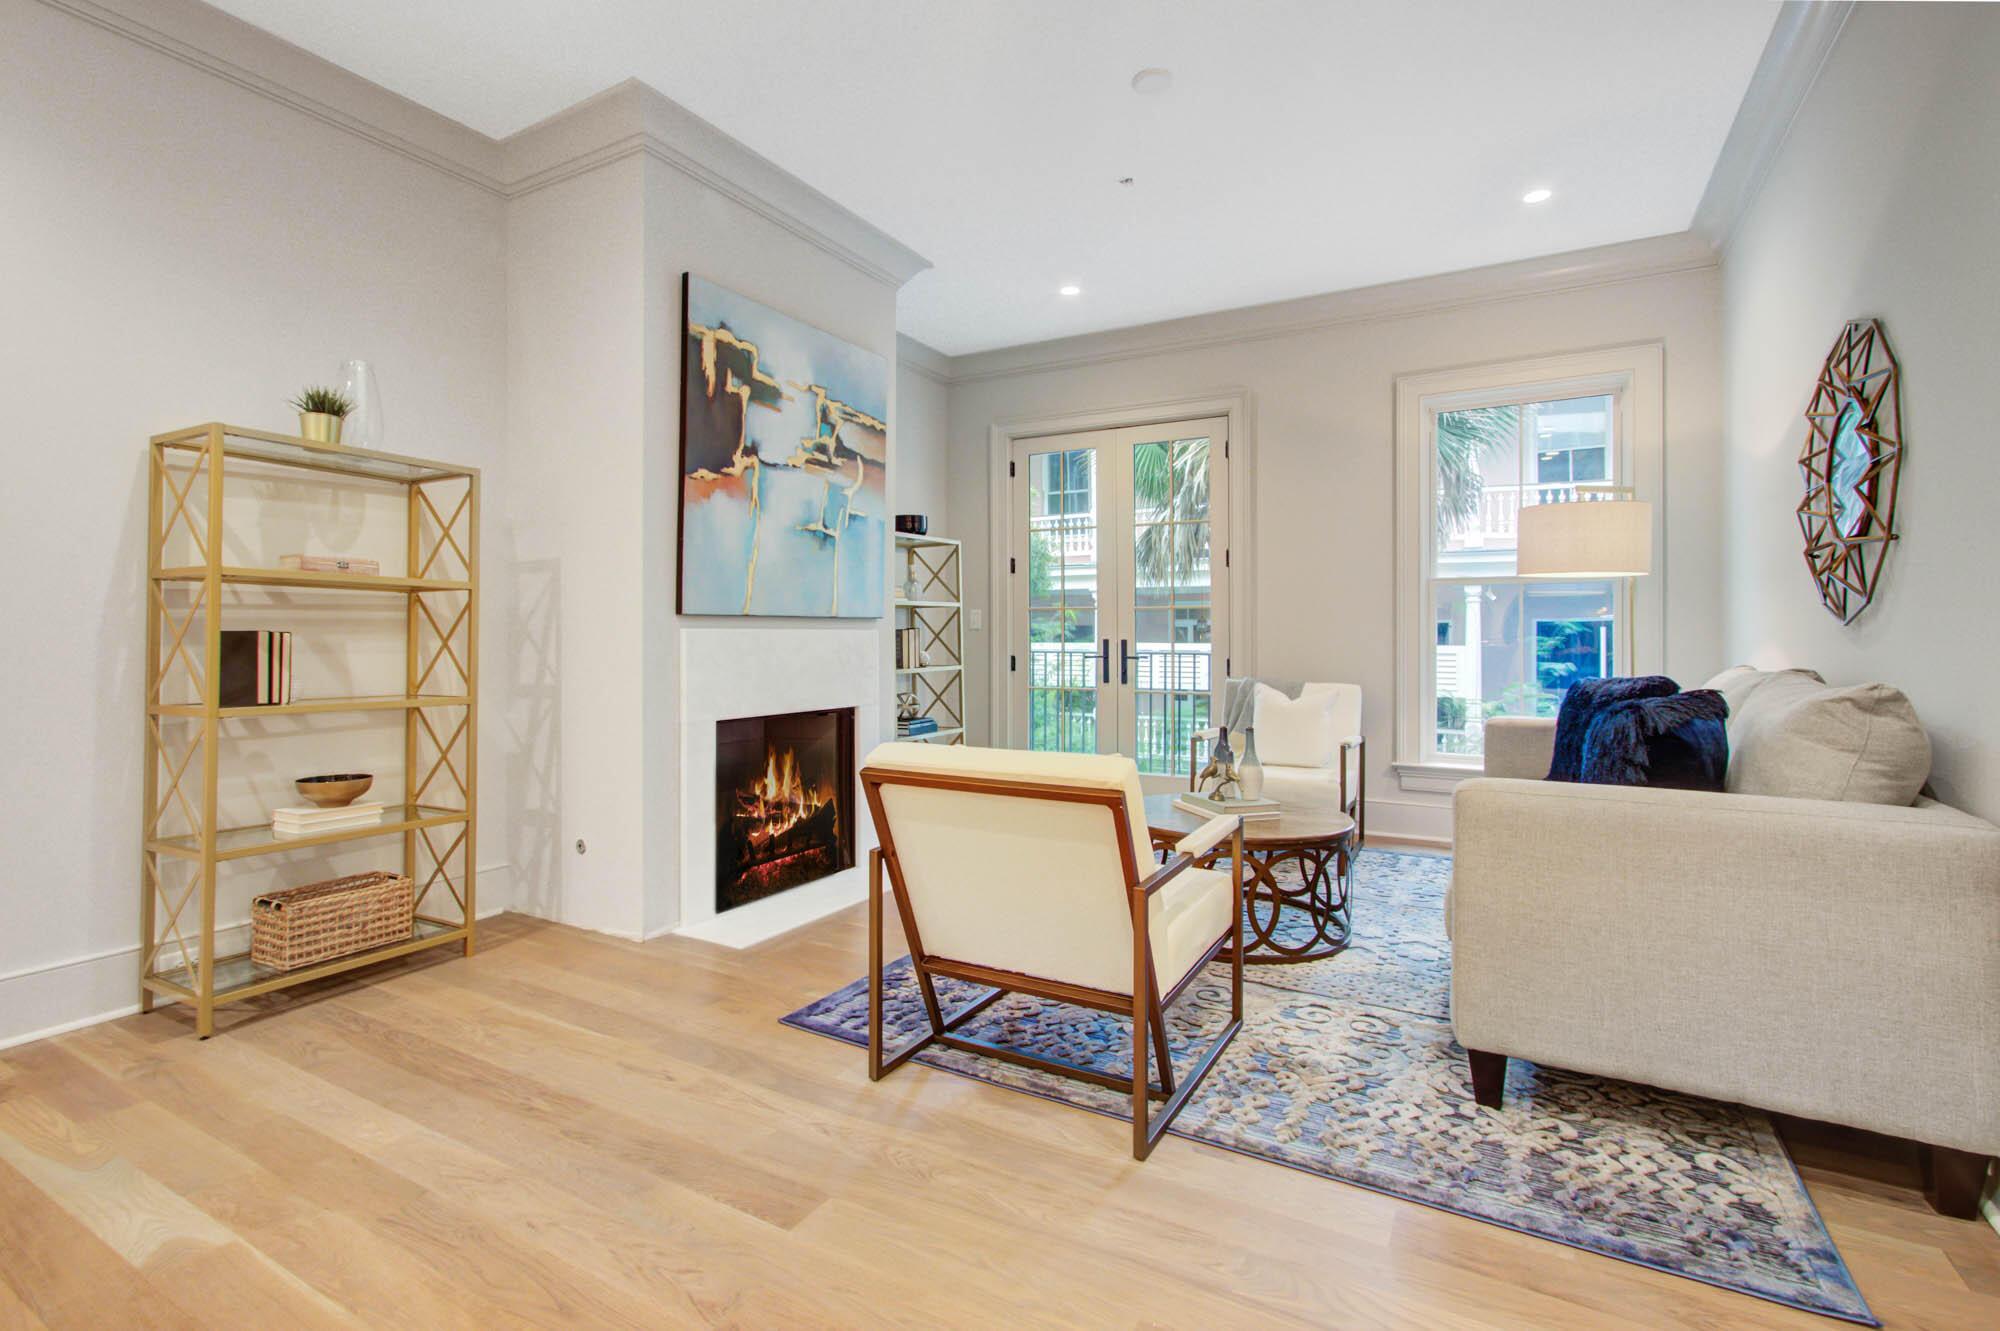 Harleston Village Homes For Sale - 31 Smith, Charleston, SC - 31